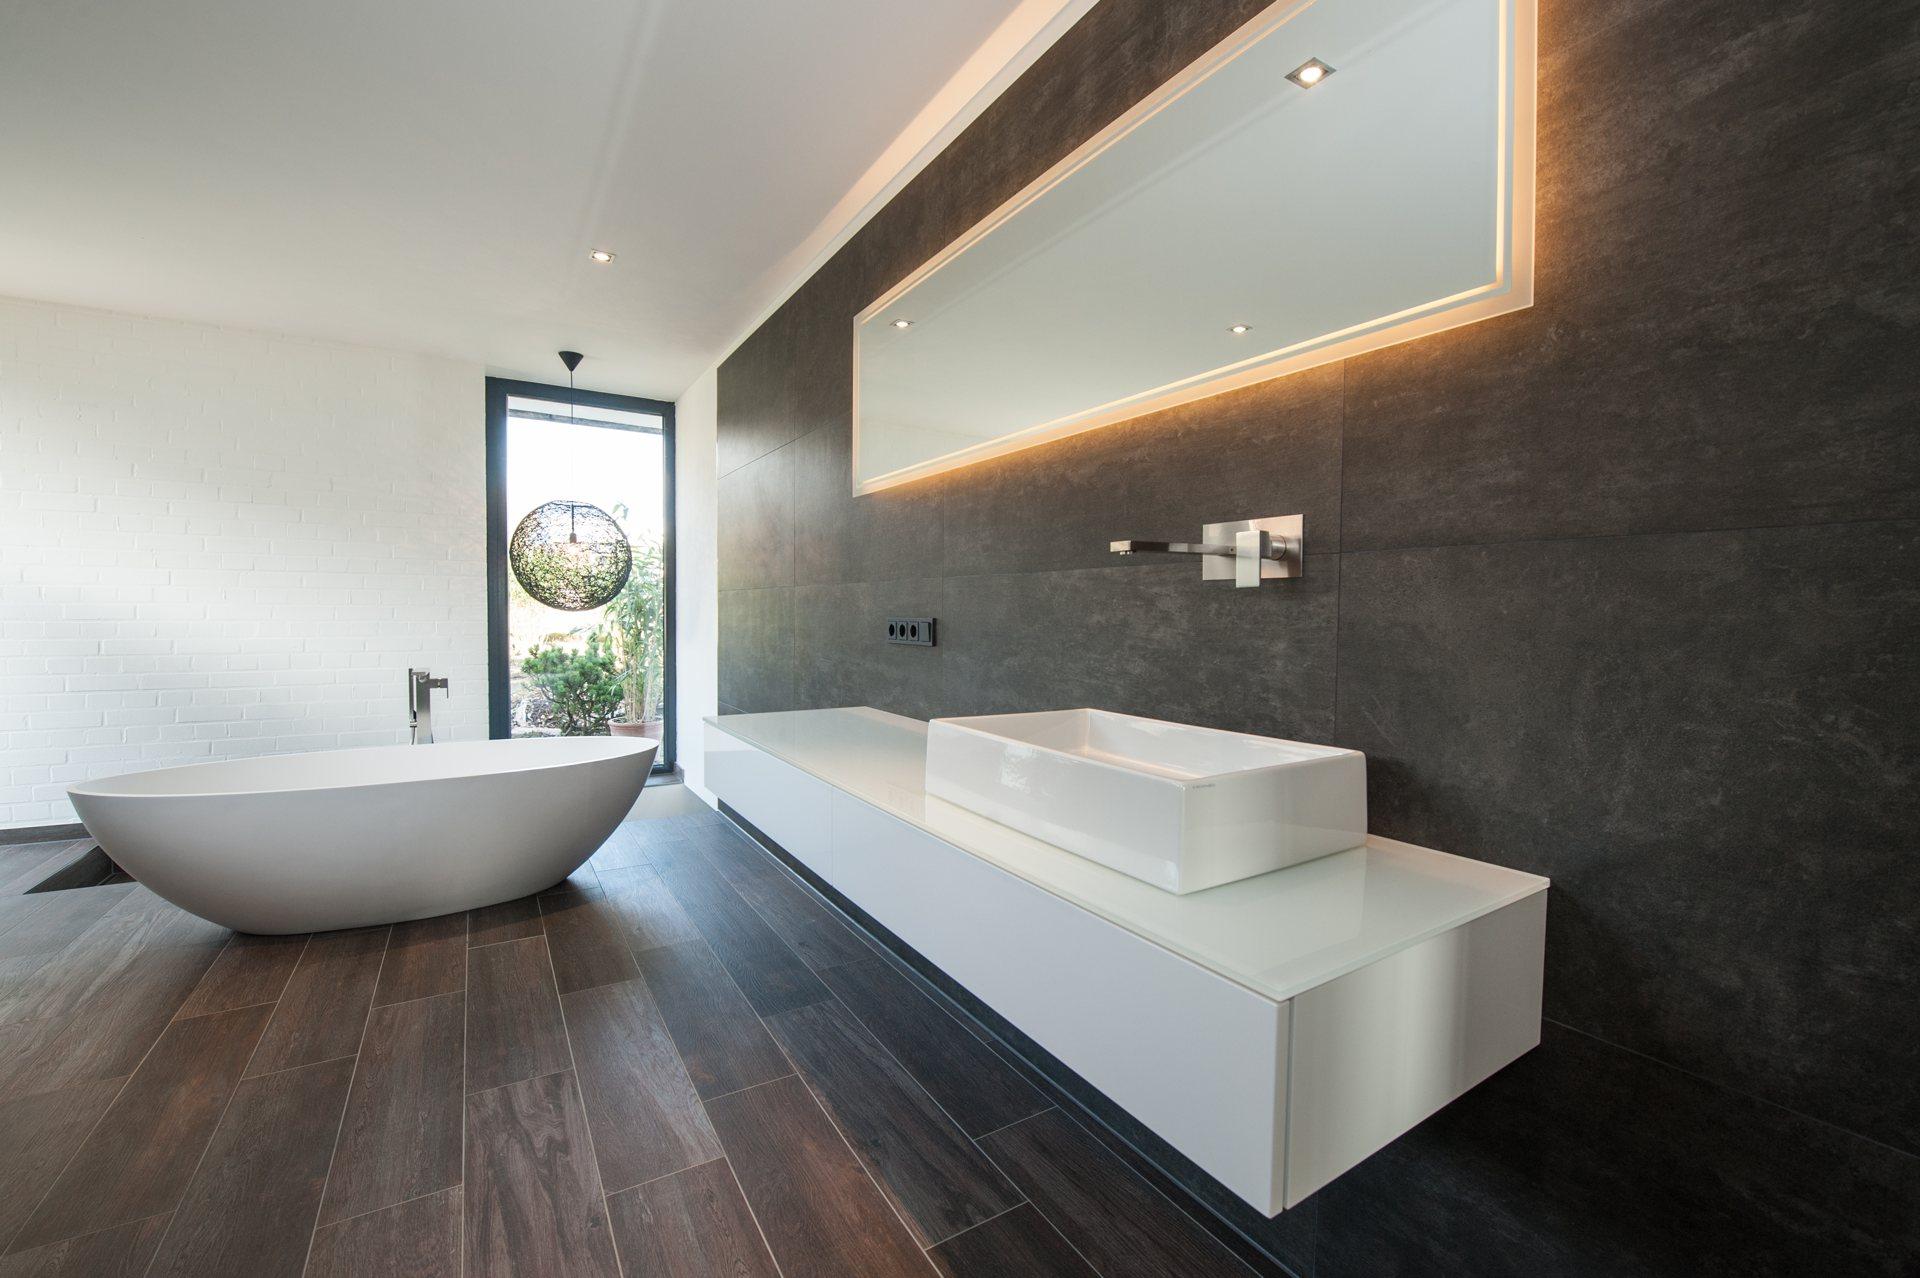 Immobilienfotografie Badezimmer